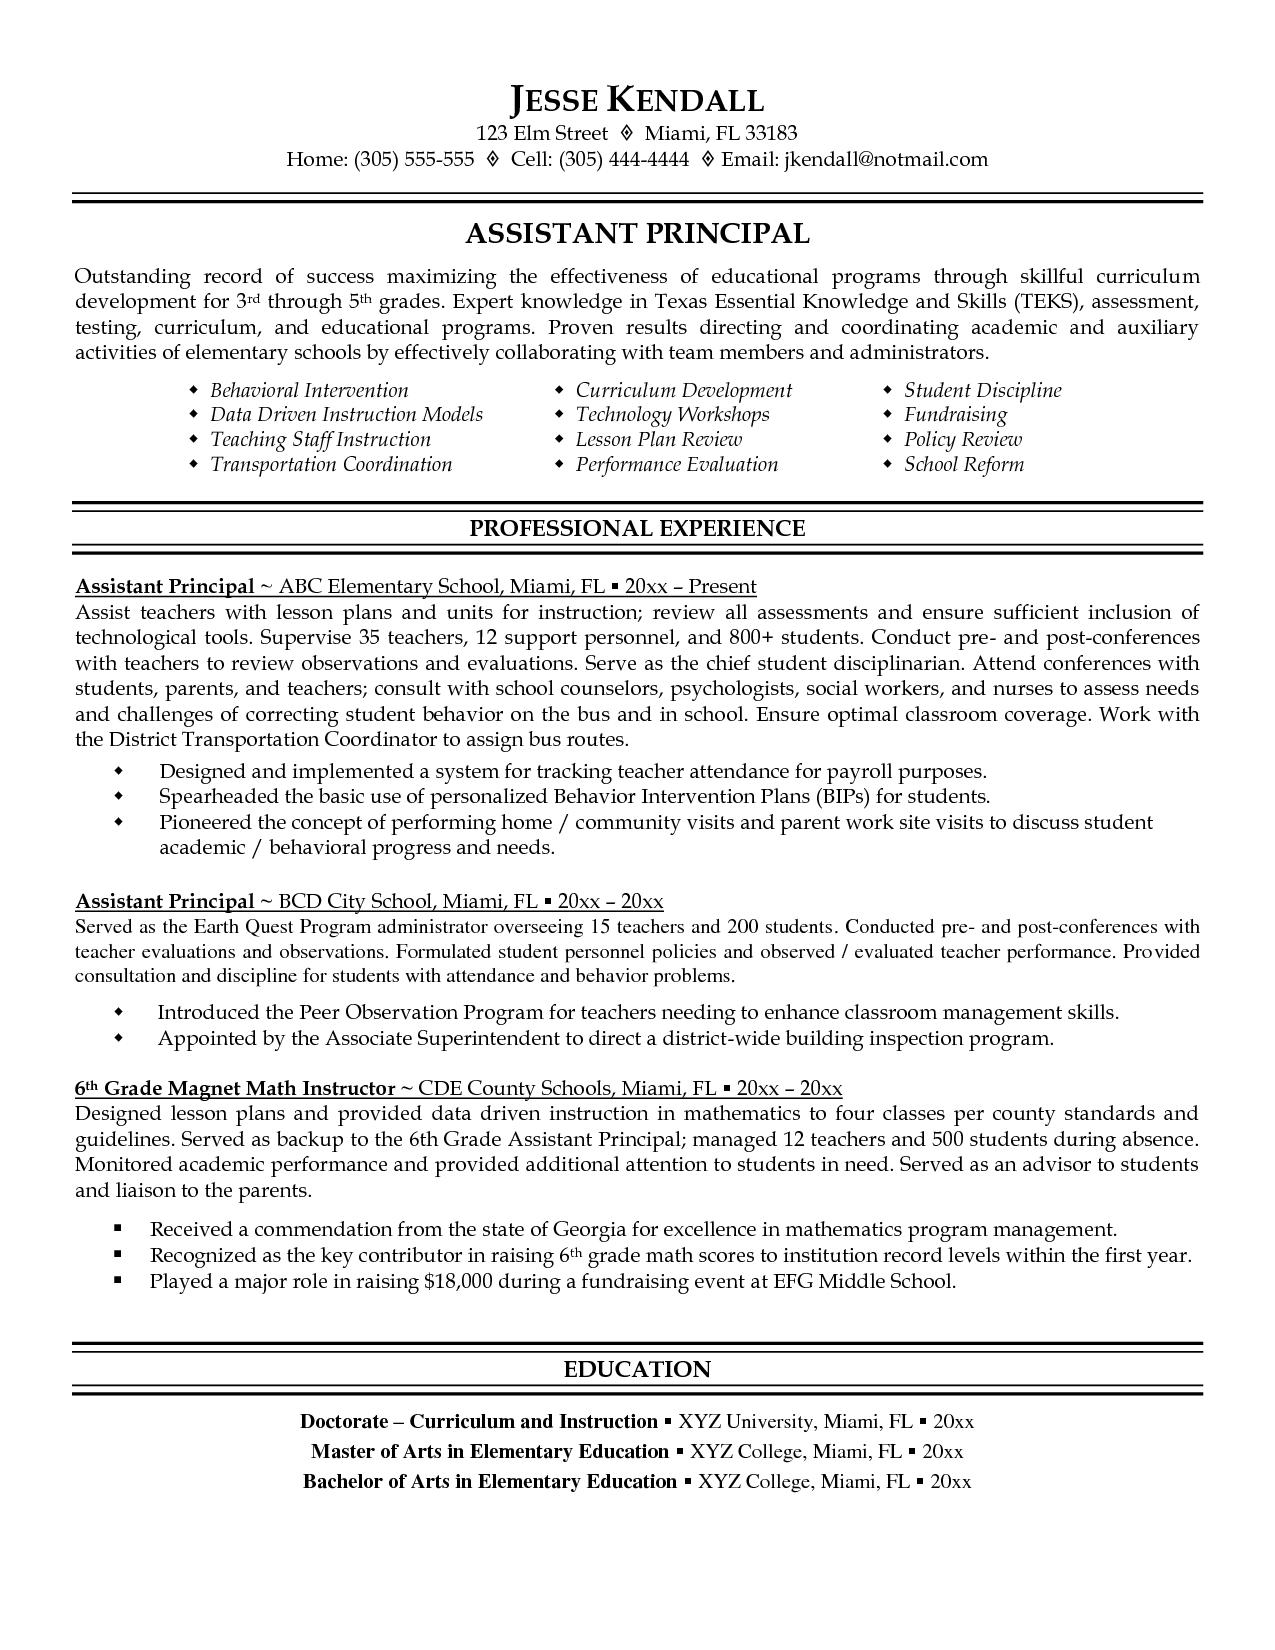 Resume And Vice Principal Assistant Principal Resume